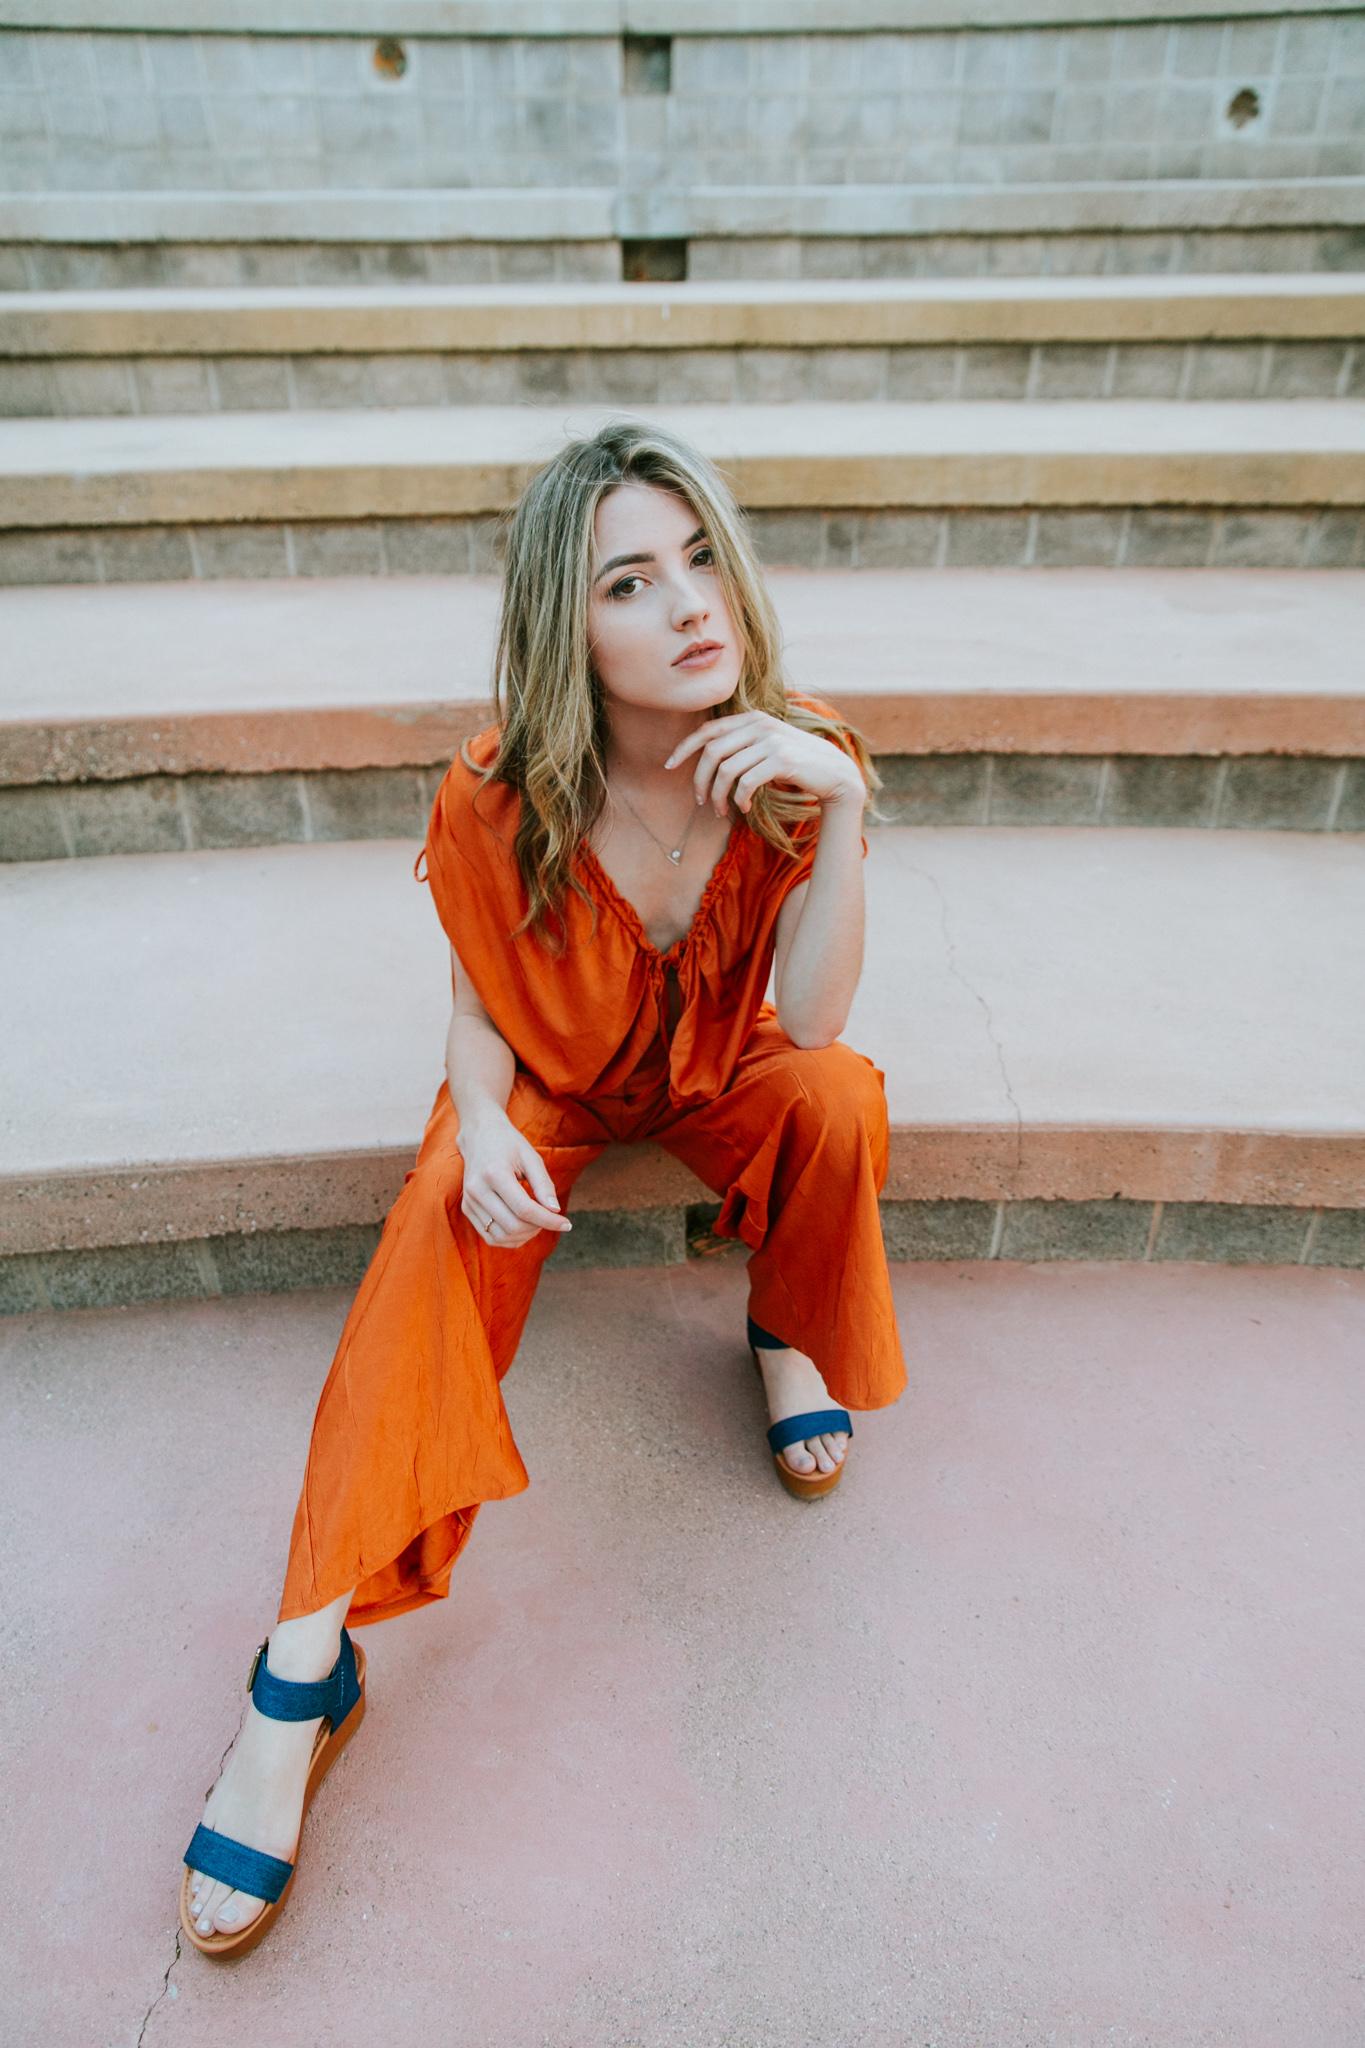 ChelseaScottEvans-Arcosanti-063.jpg